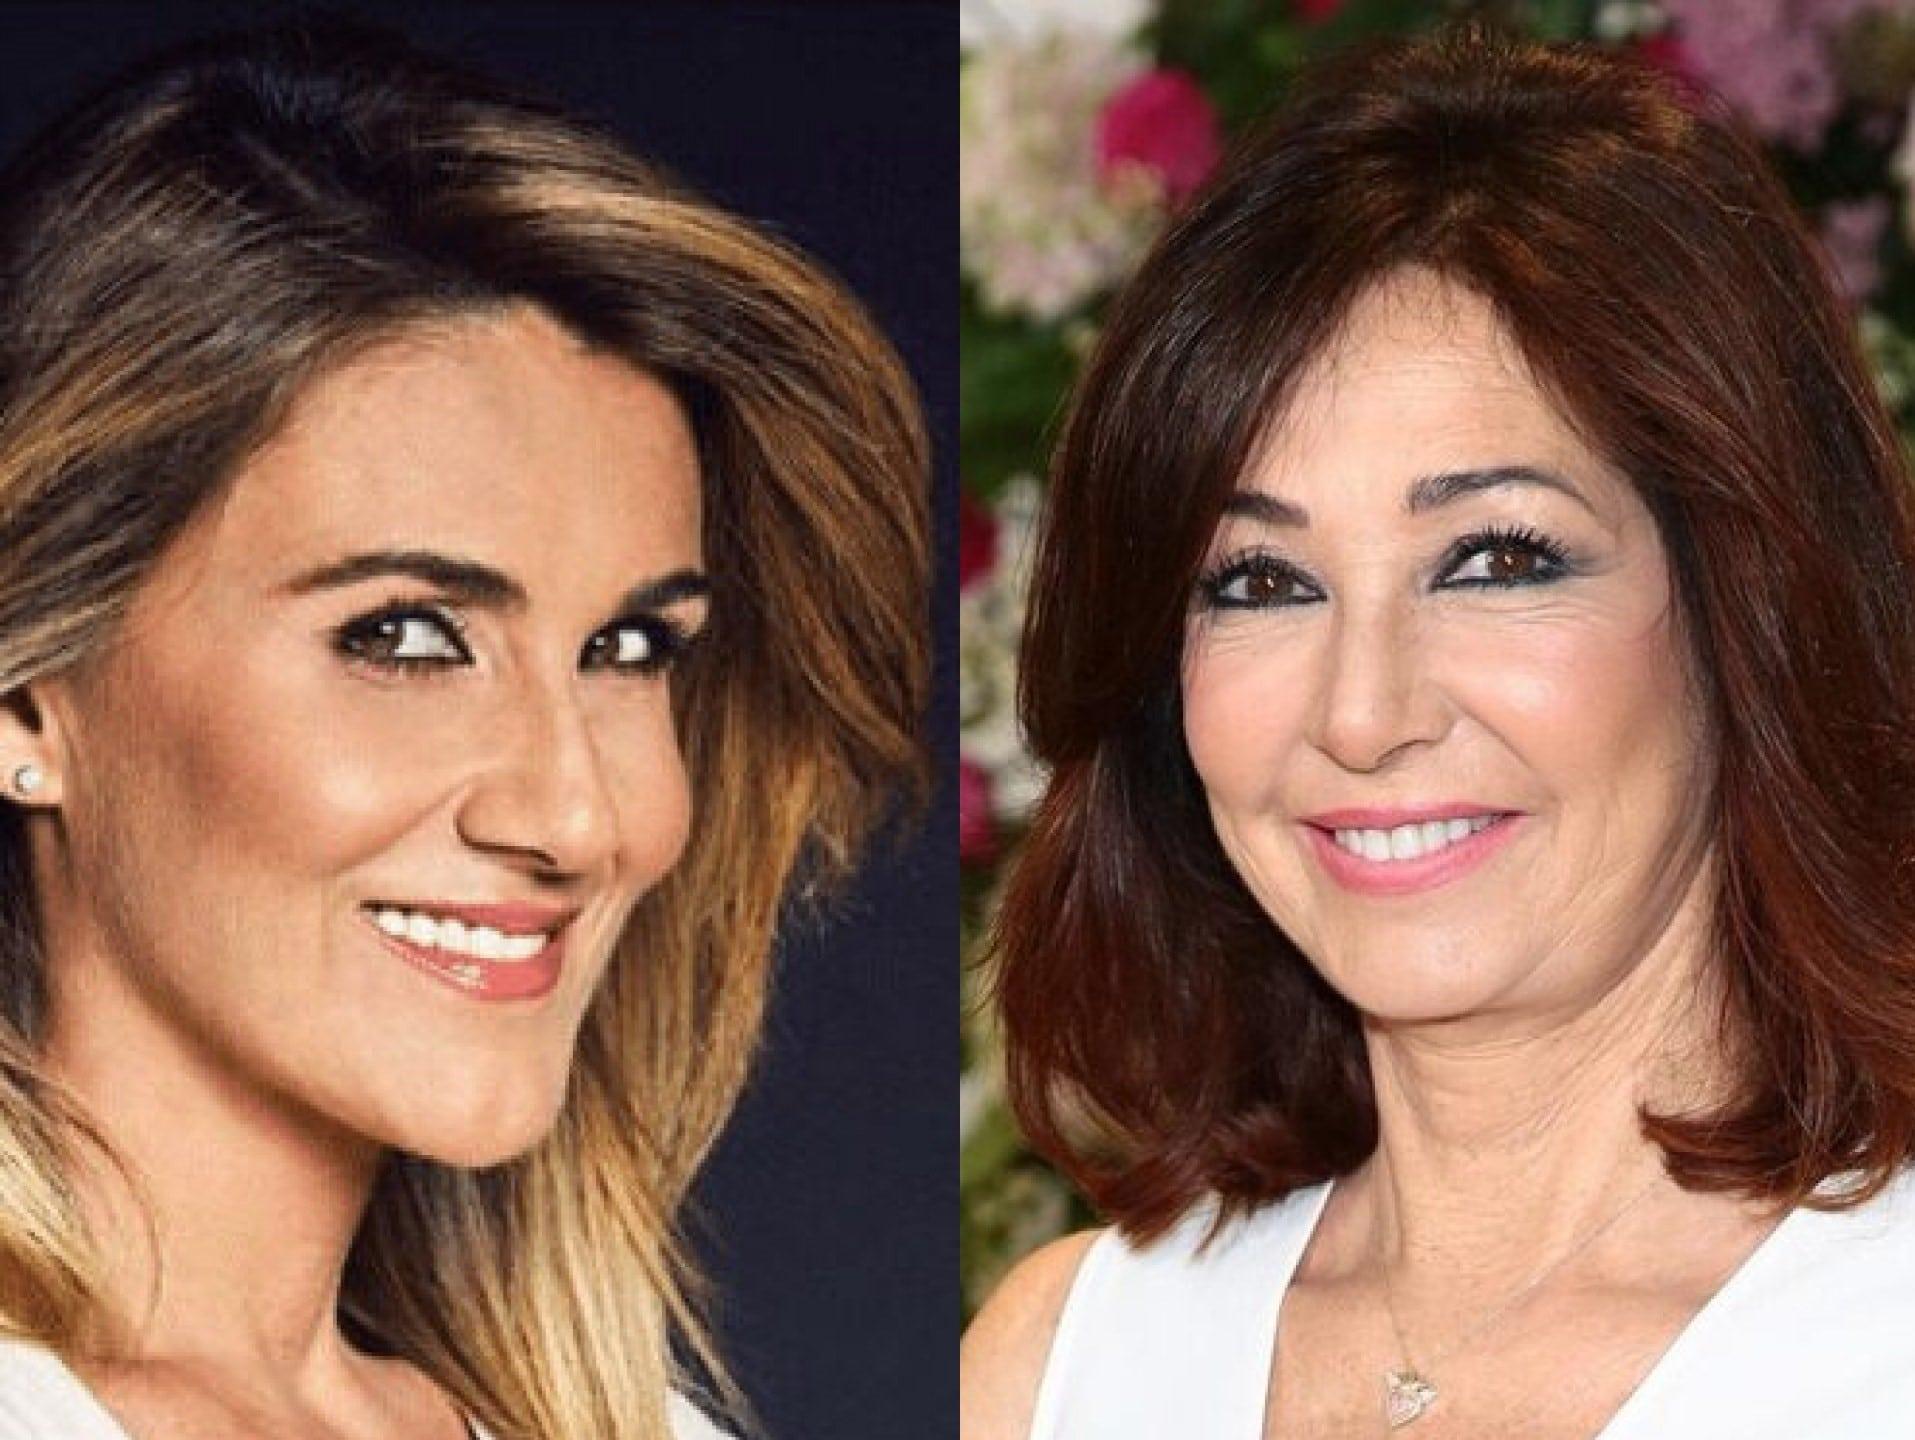 Guerra abierta entre Ana Rosa Quintana y Carlota Corredera